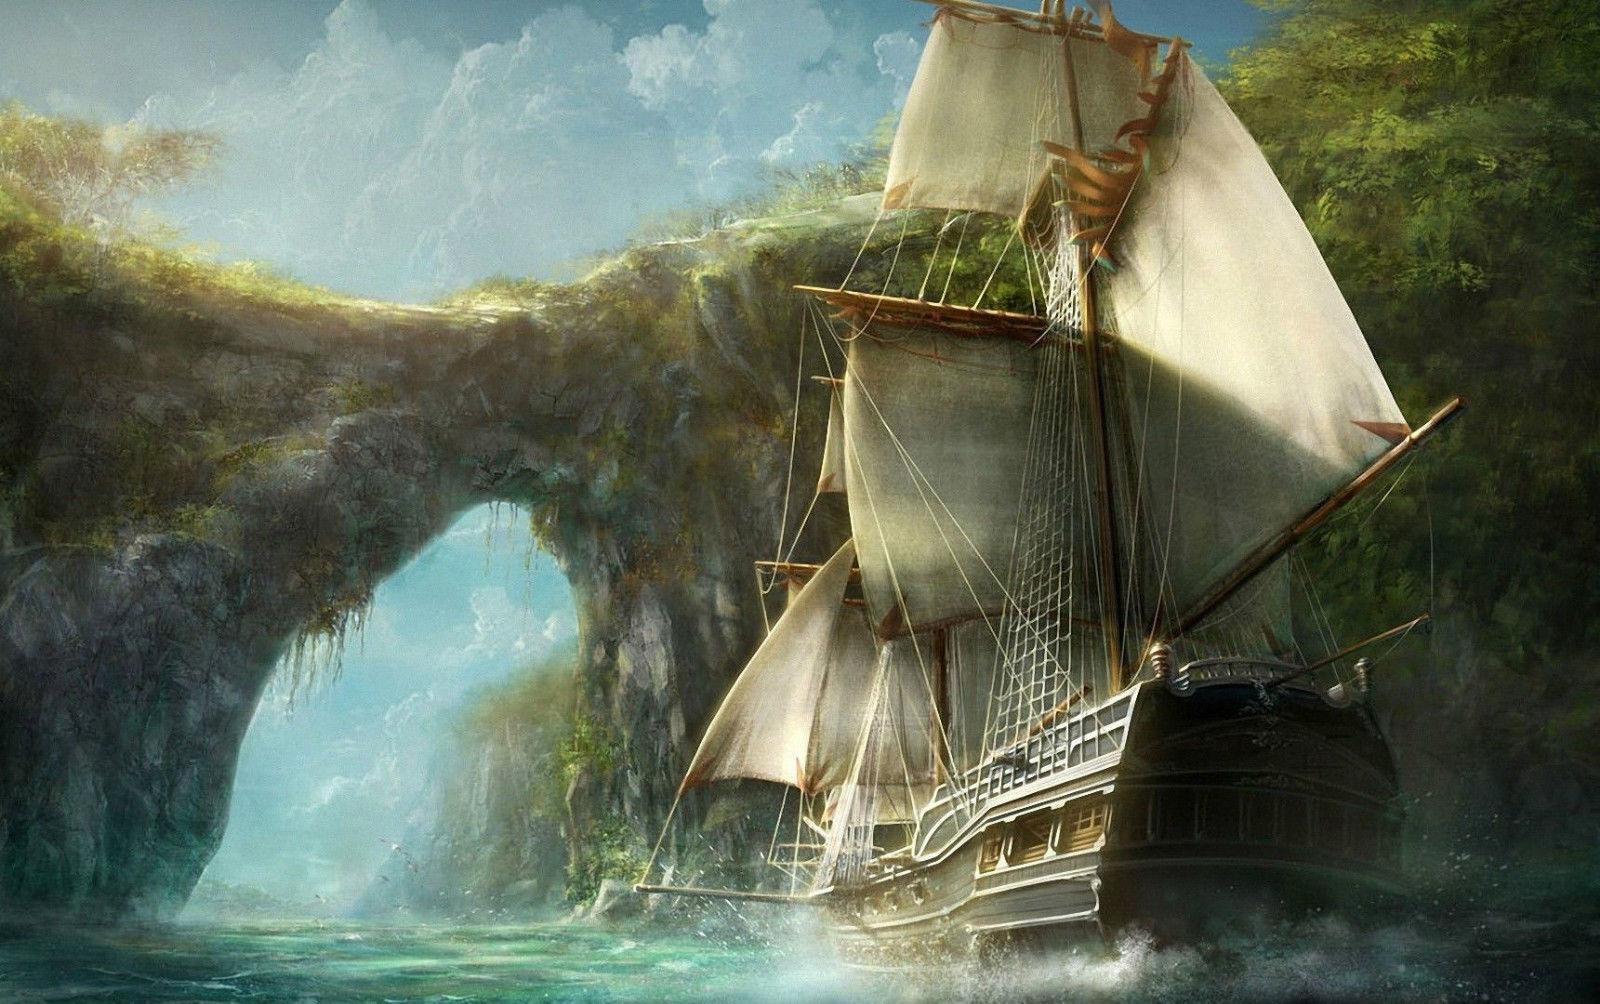 Pirate Ship Sailing the High Seas to Treasure Island Art Silk Print Poster 24x36inch(60x90cm) 089